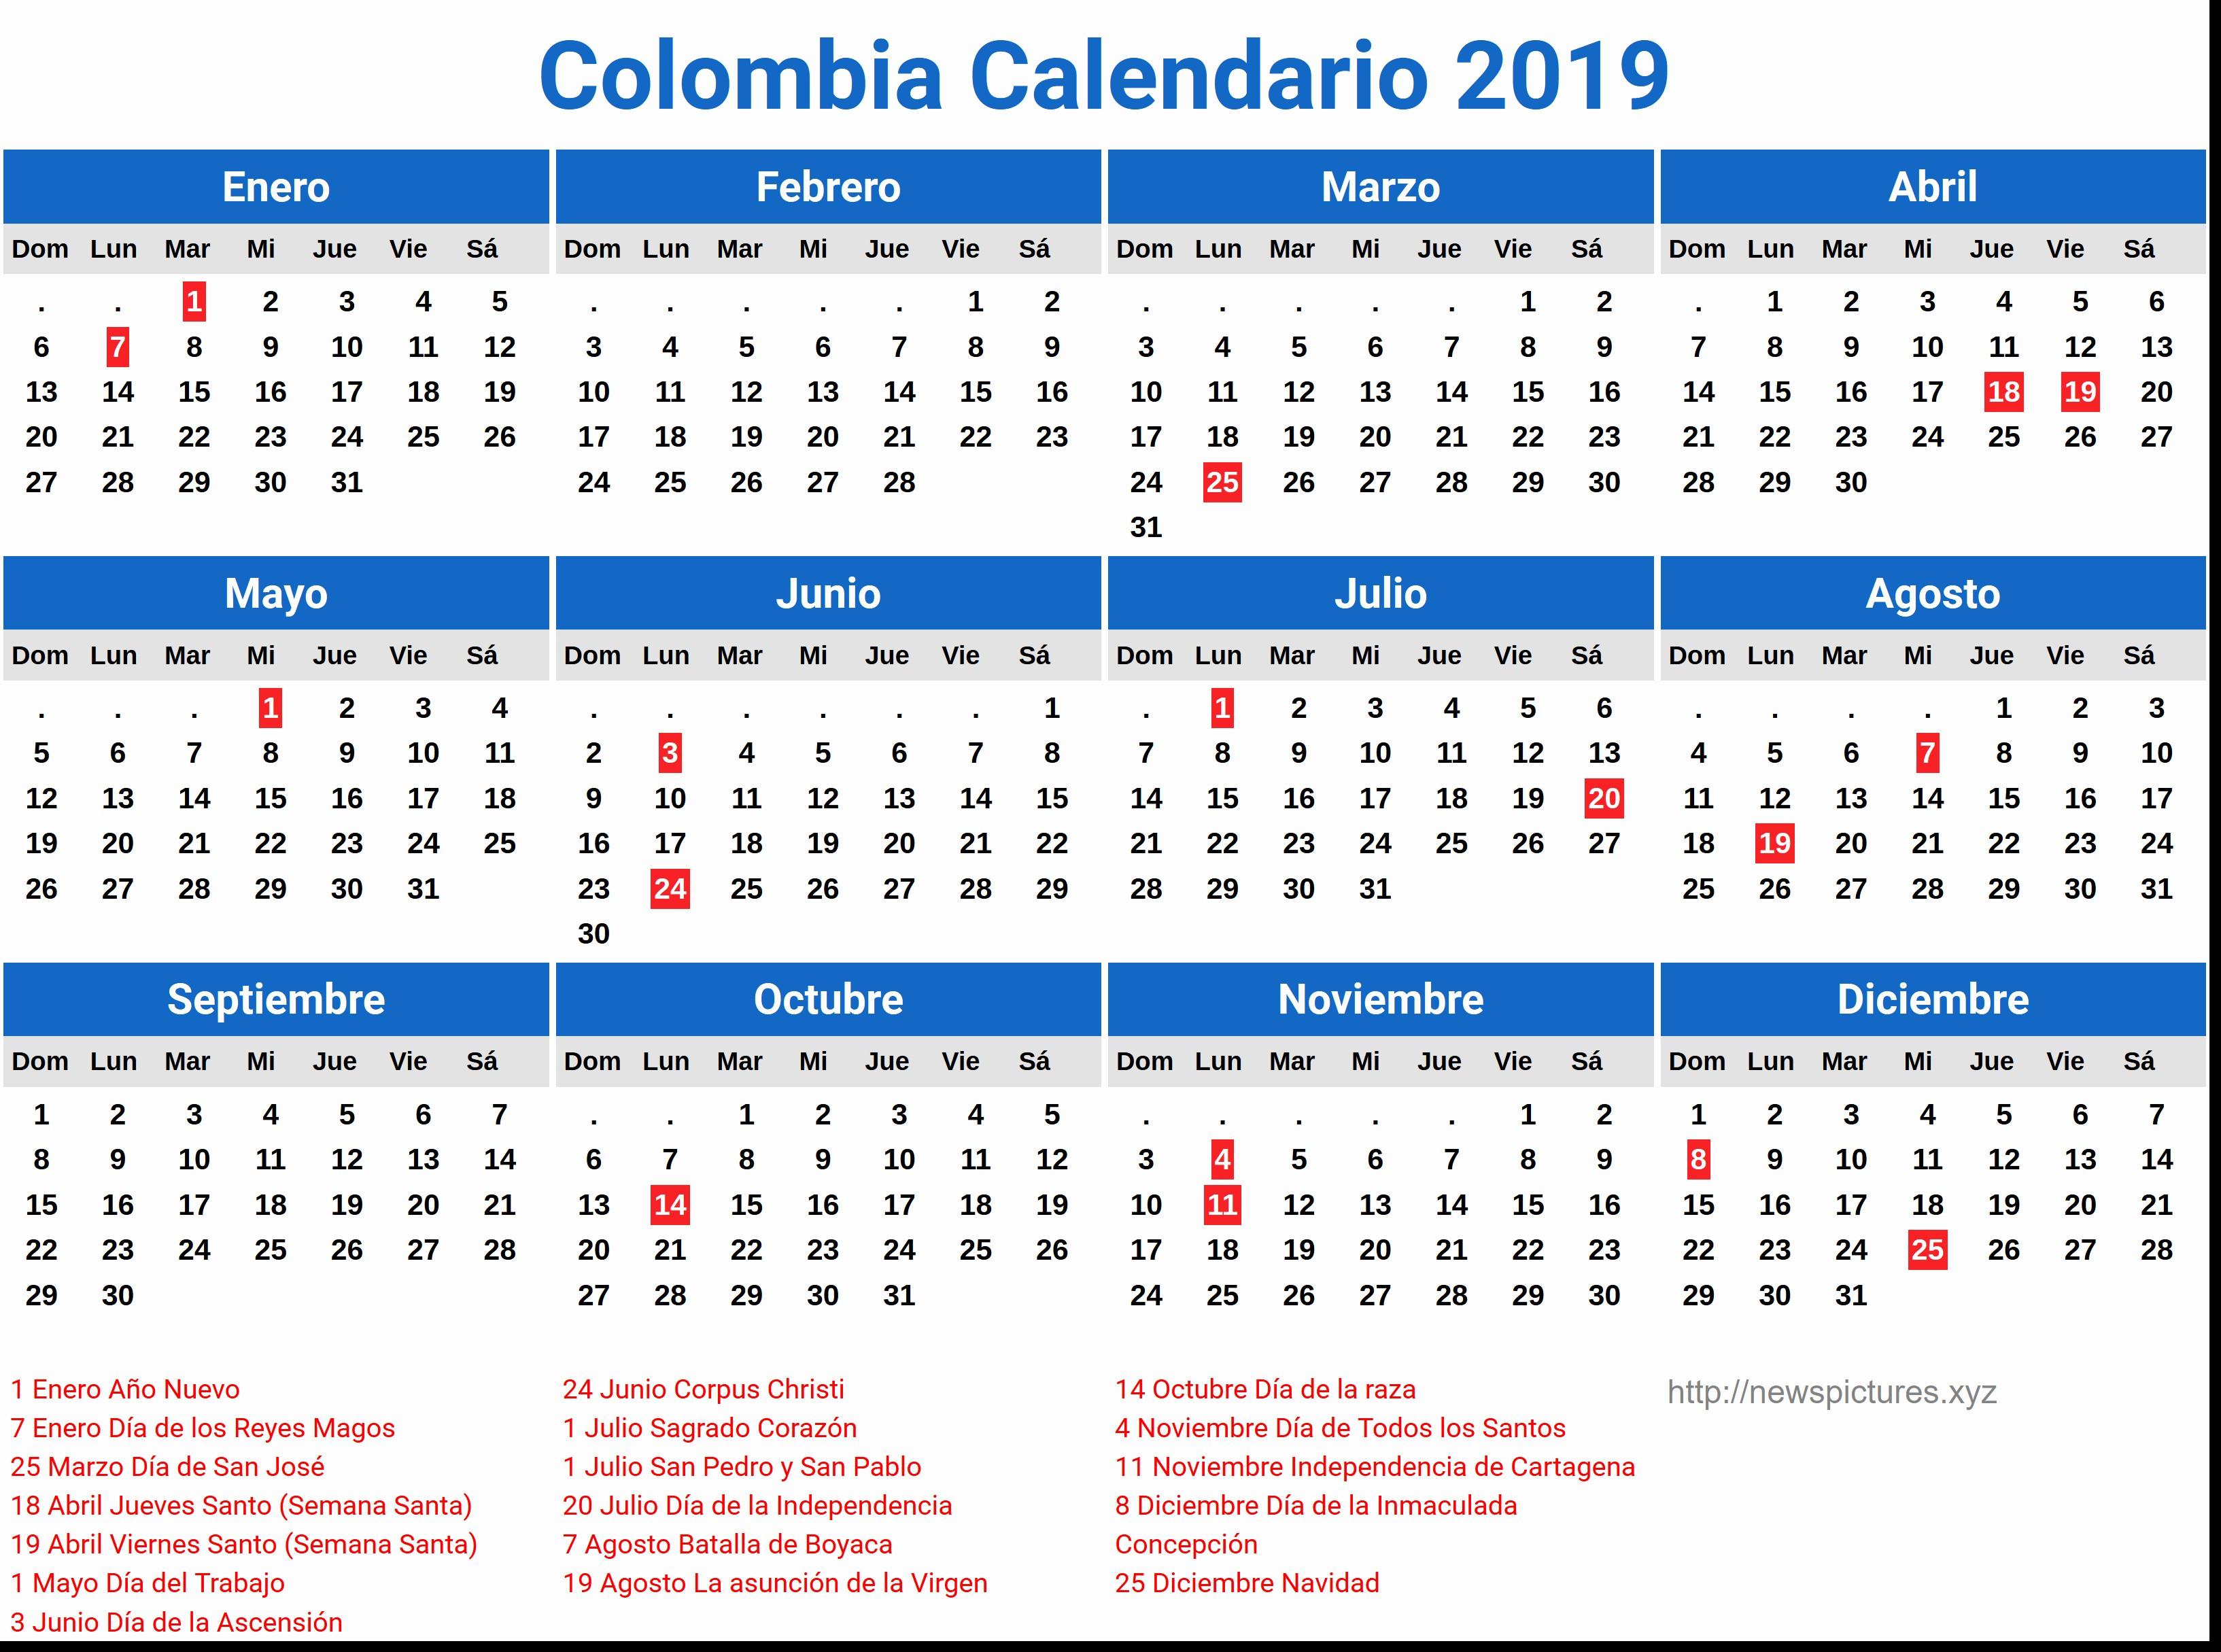 Calendario 2019 Mexico Con Dias Festivos Para Imprimir Más Recientes Calendario Meccanocar 2019 Calendario Marzo 2019 Of Calendario 2019 Mexico Con Dias Festivos Para Imprimir Más Recientes Actualidad Calendario 2019 Mexico Con Festivos